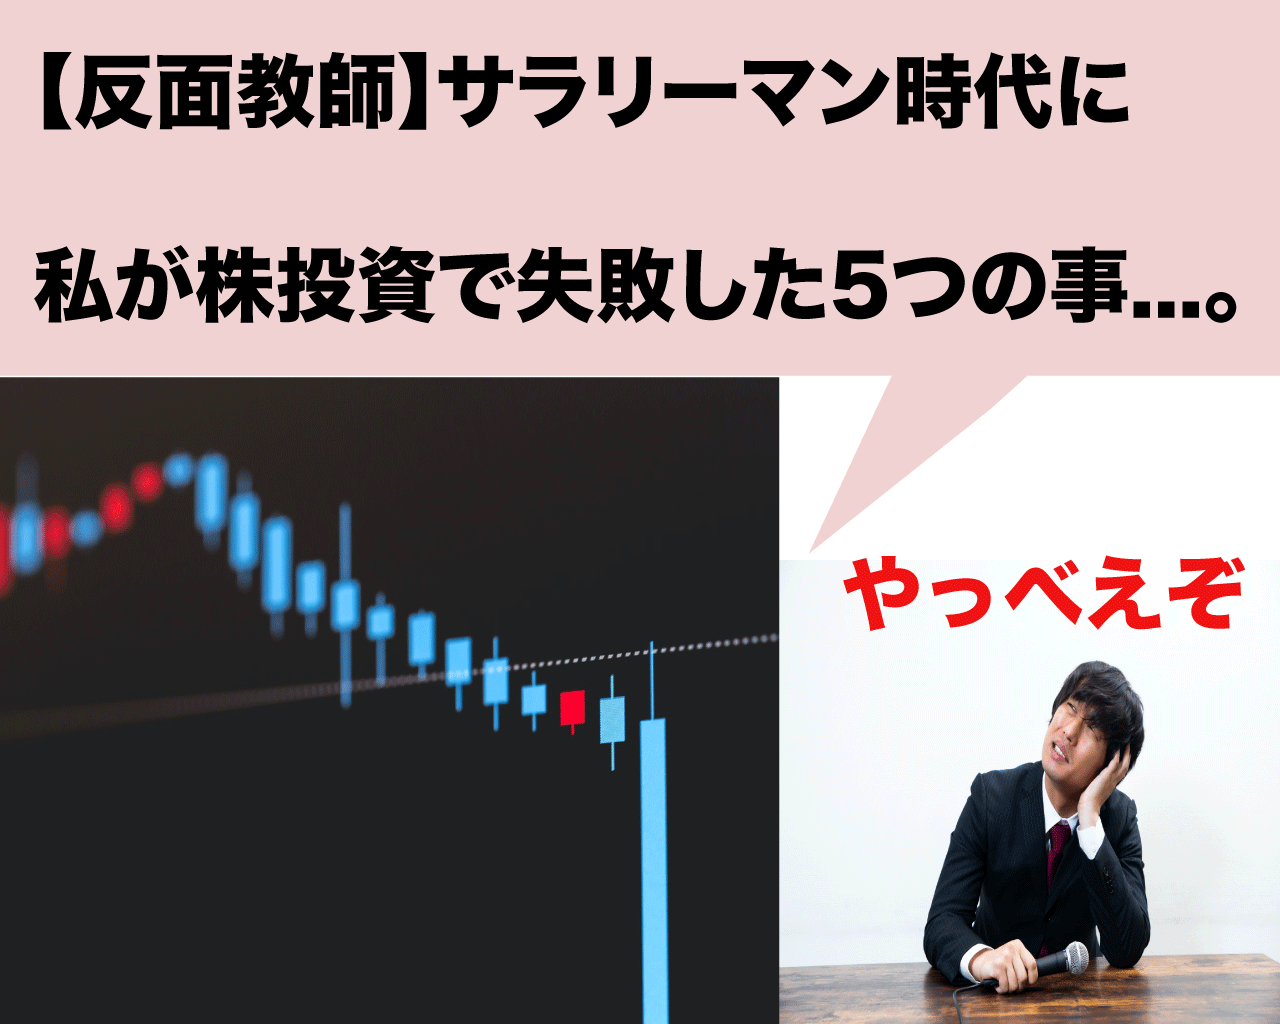 株式ー失敗